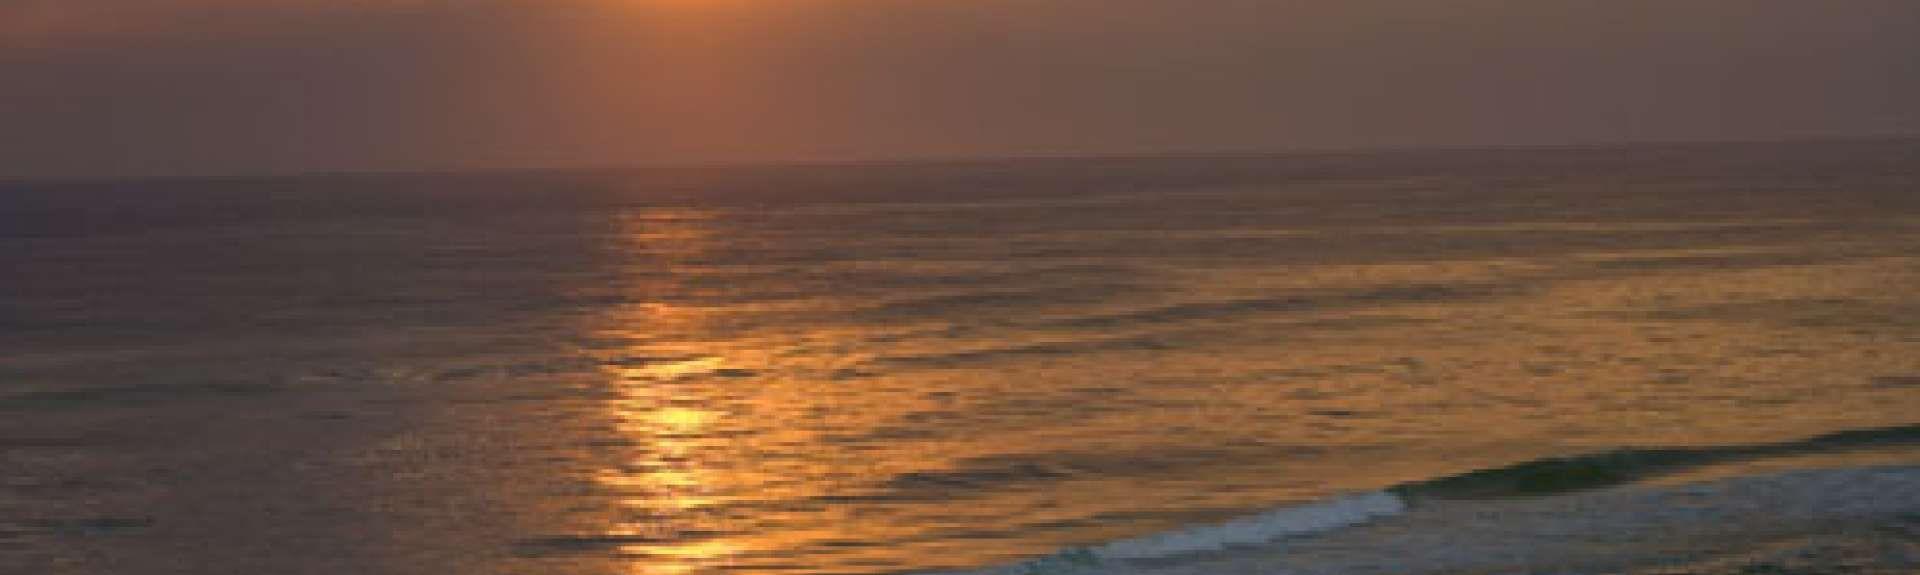 Mariner East, Panama City Beach, FL, USA